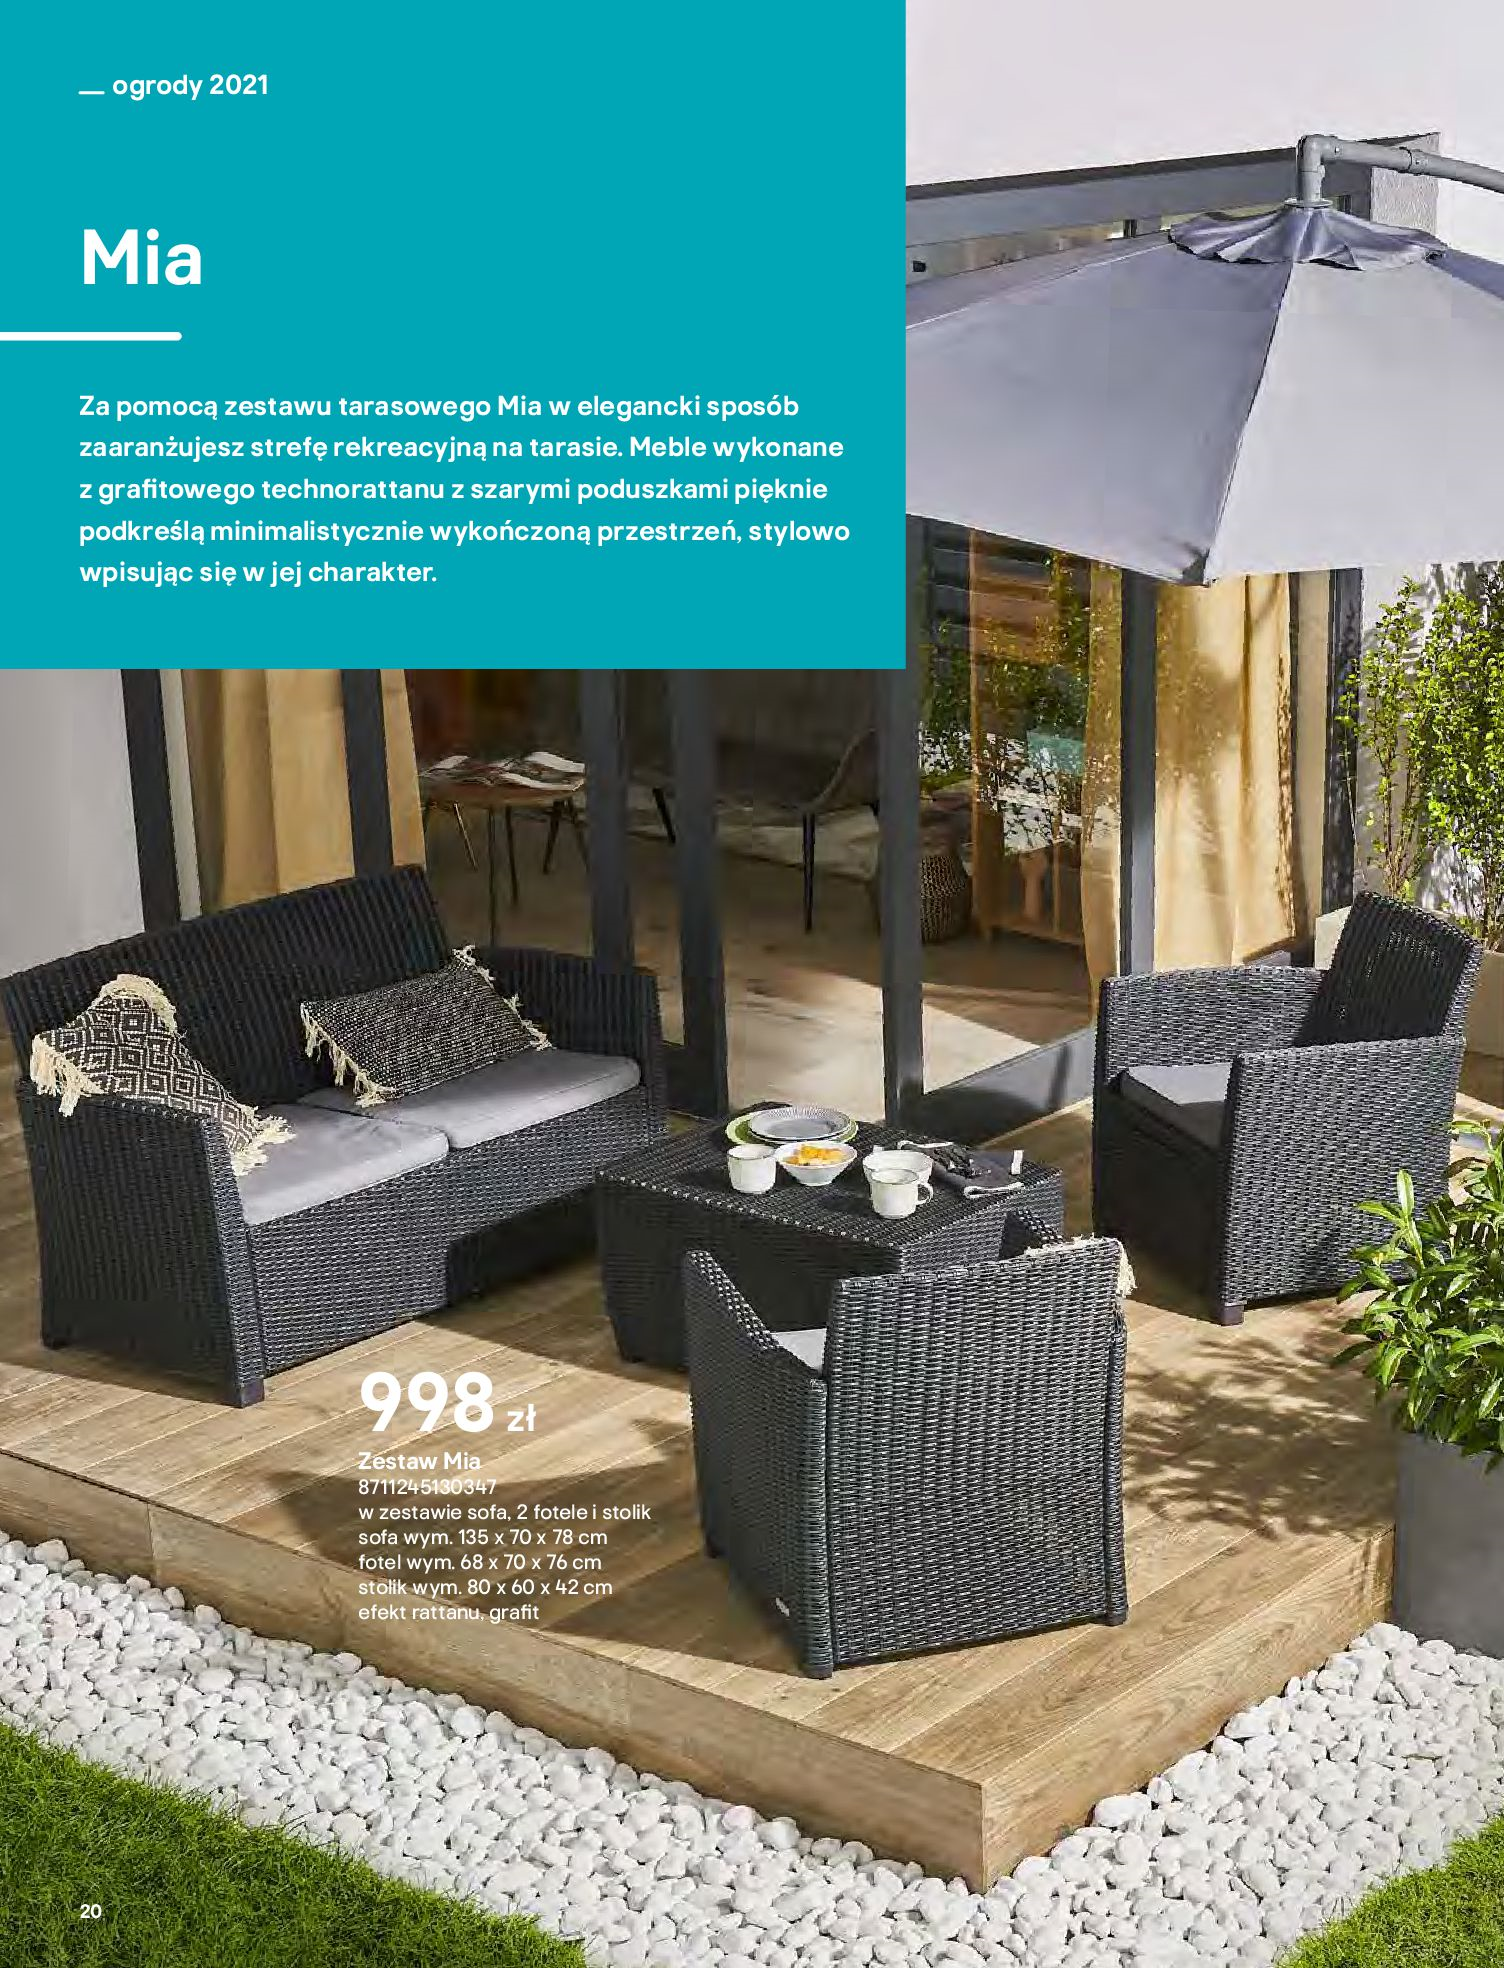 Gazetka Castorama: Katalog ogrody 2021-03-01 page-20